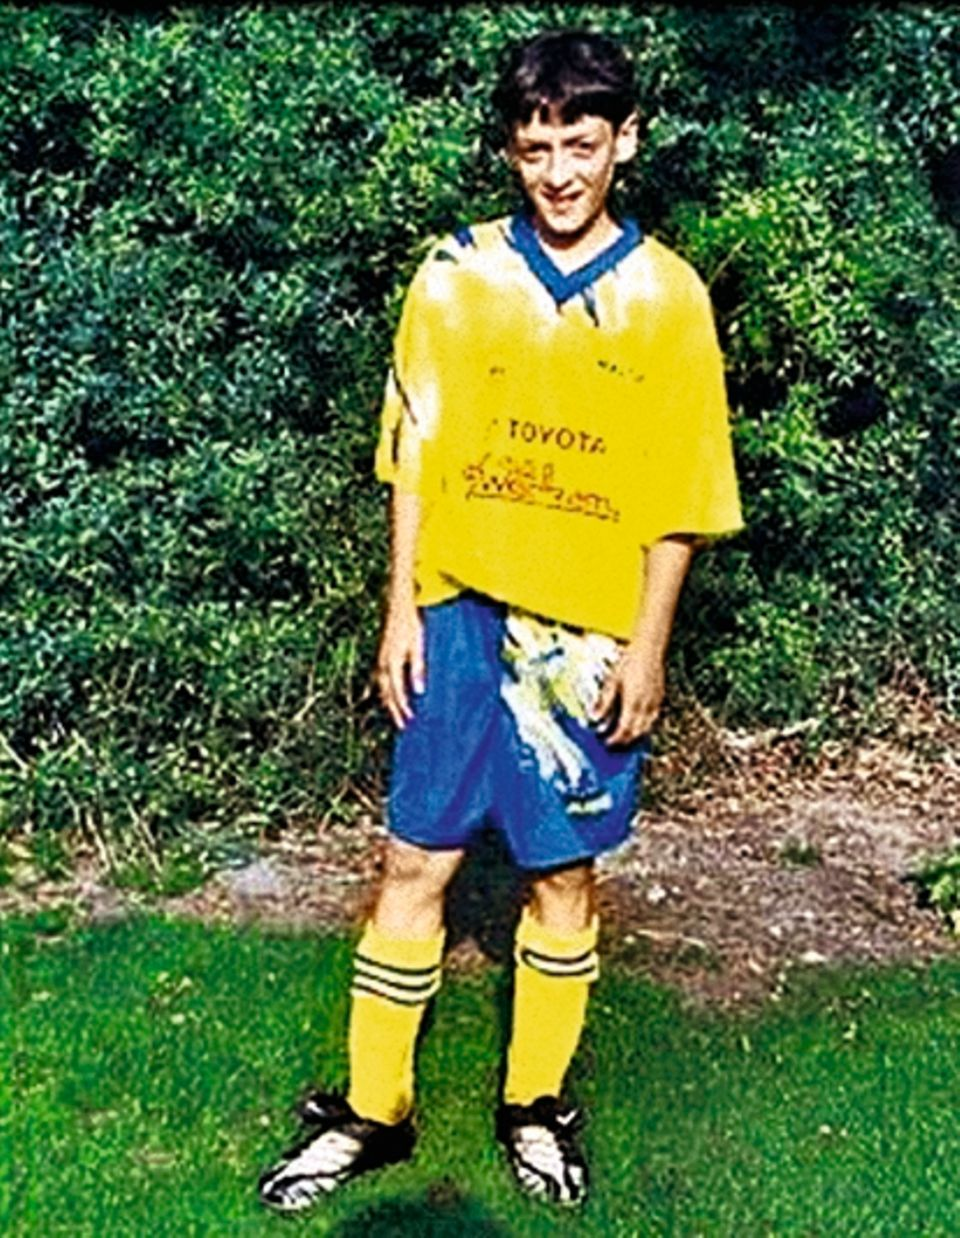 Özil als Jugendspieler im Ruhrgebiet